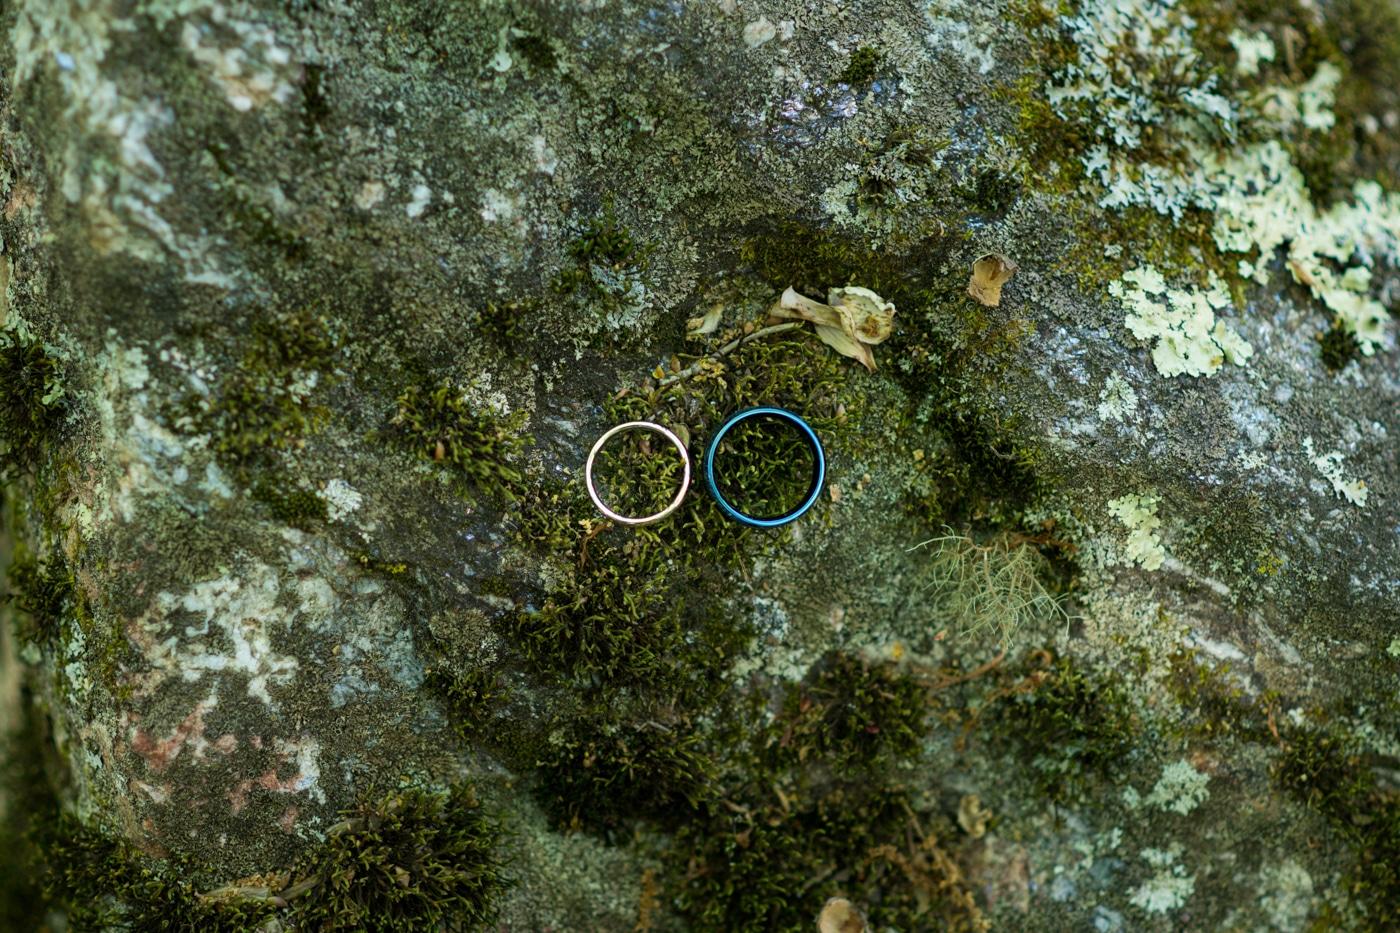 wedding rings on mossy rock by lake